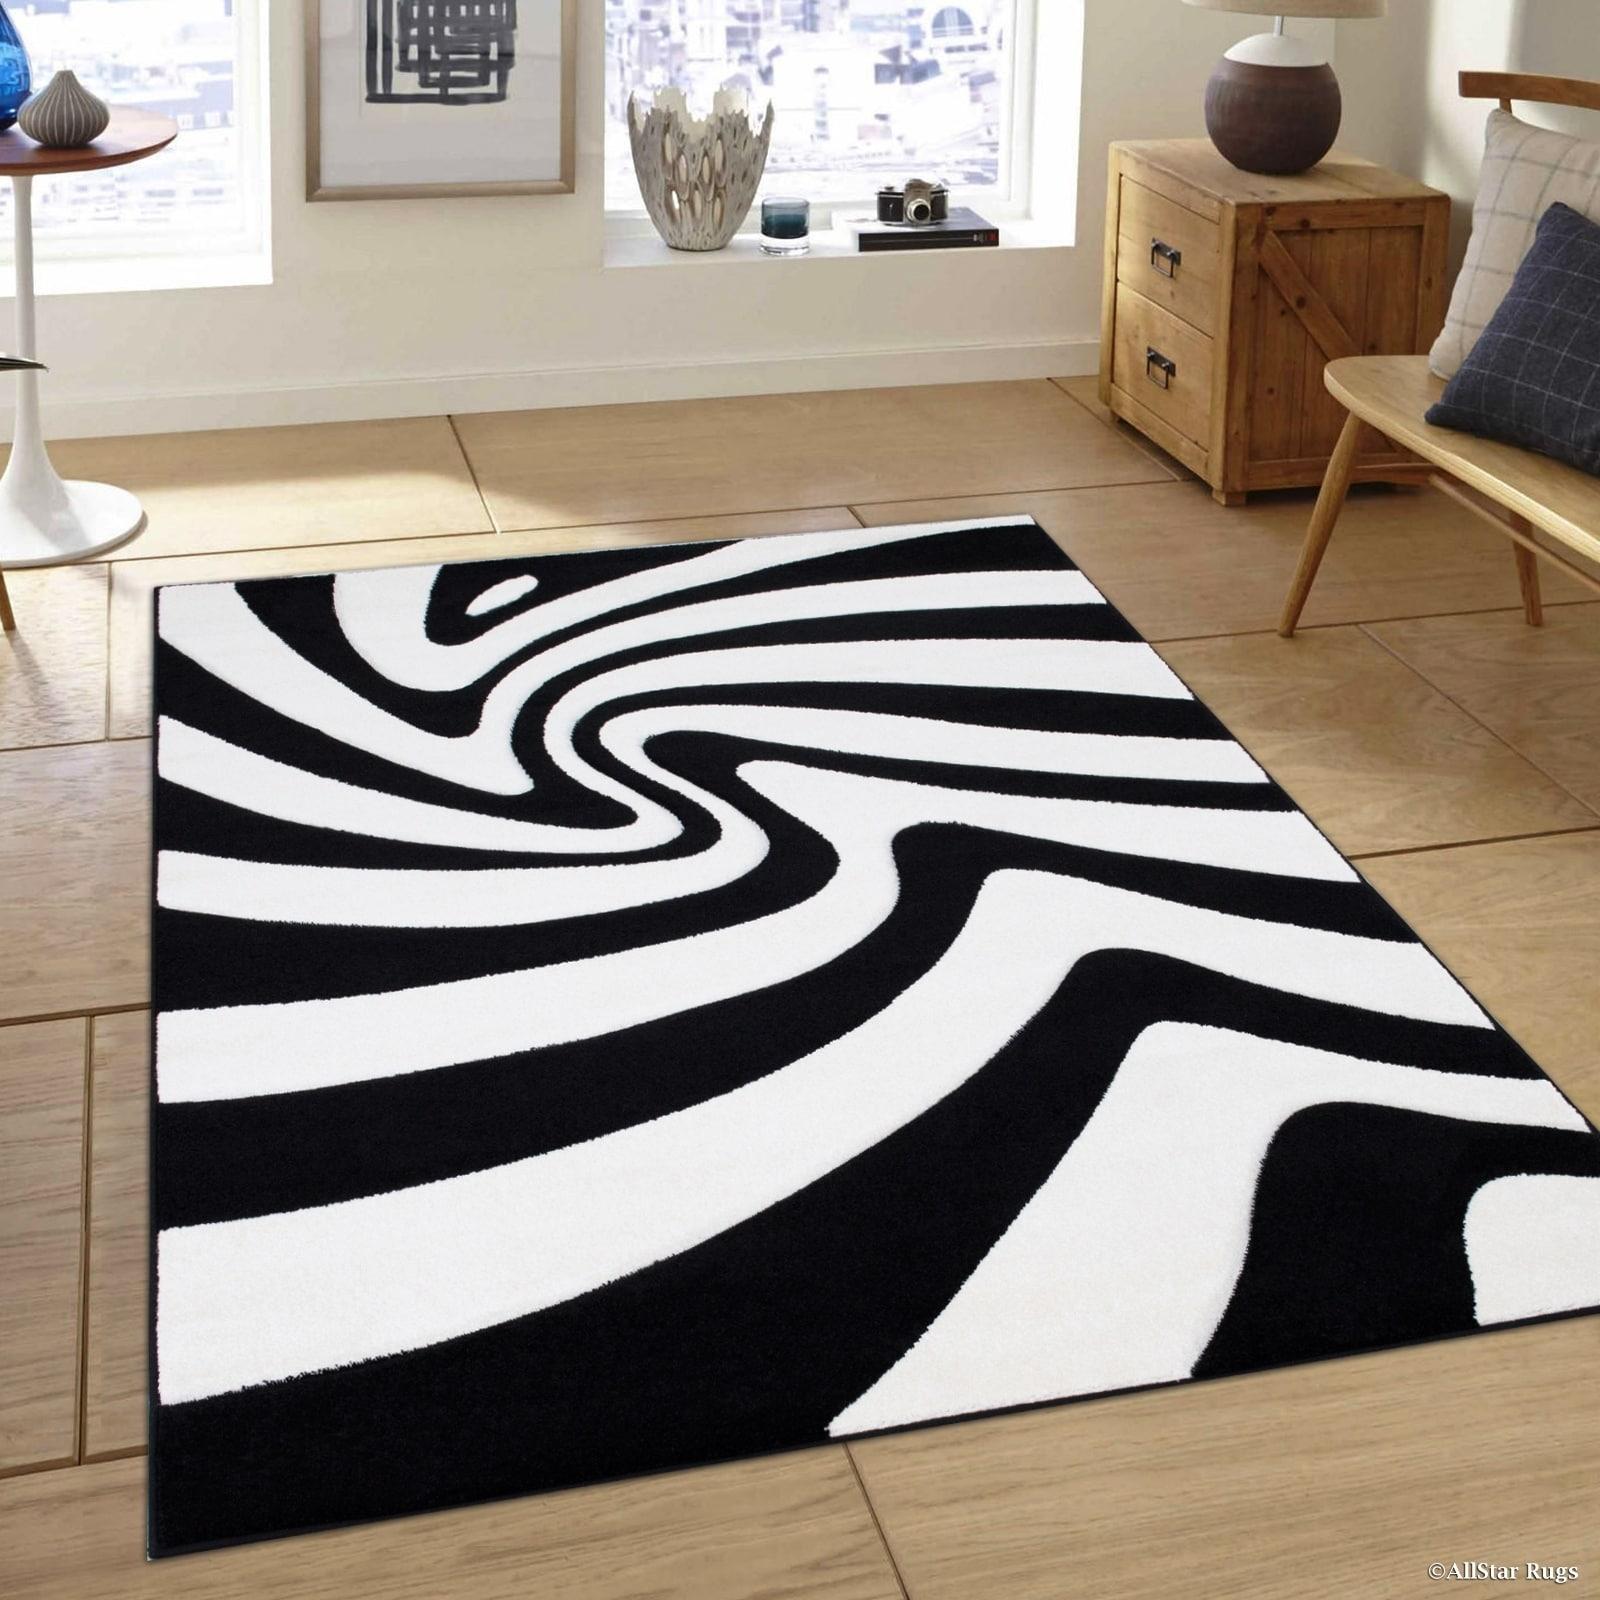 Shop Allstar Black White Geometric Colorblock Design